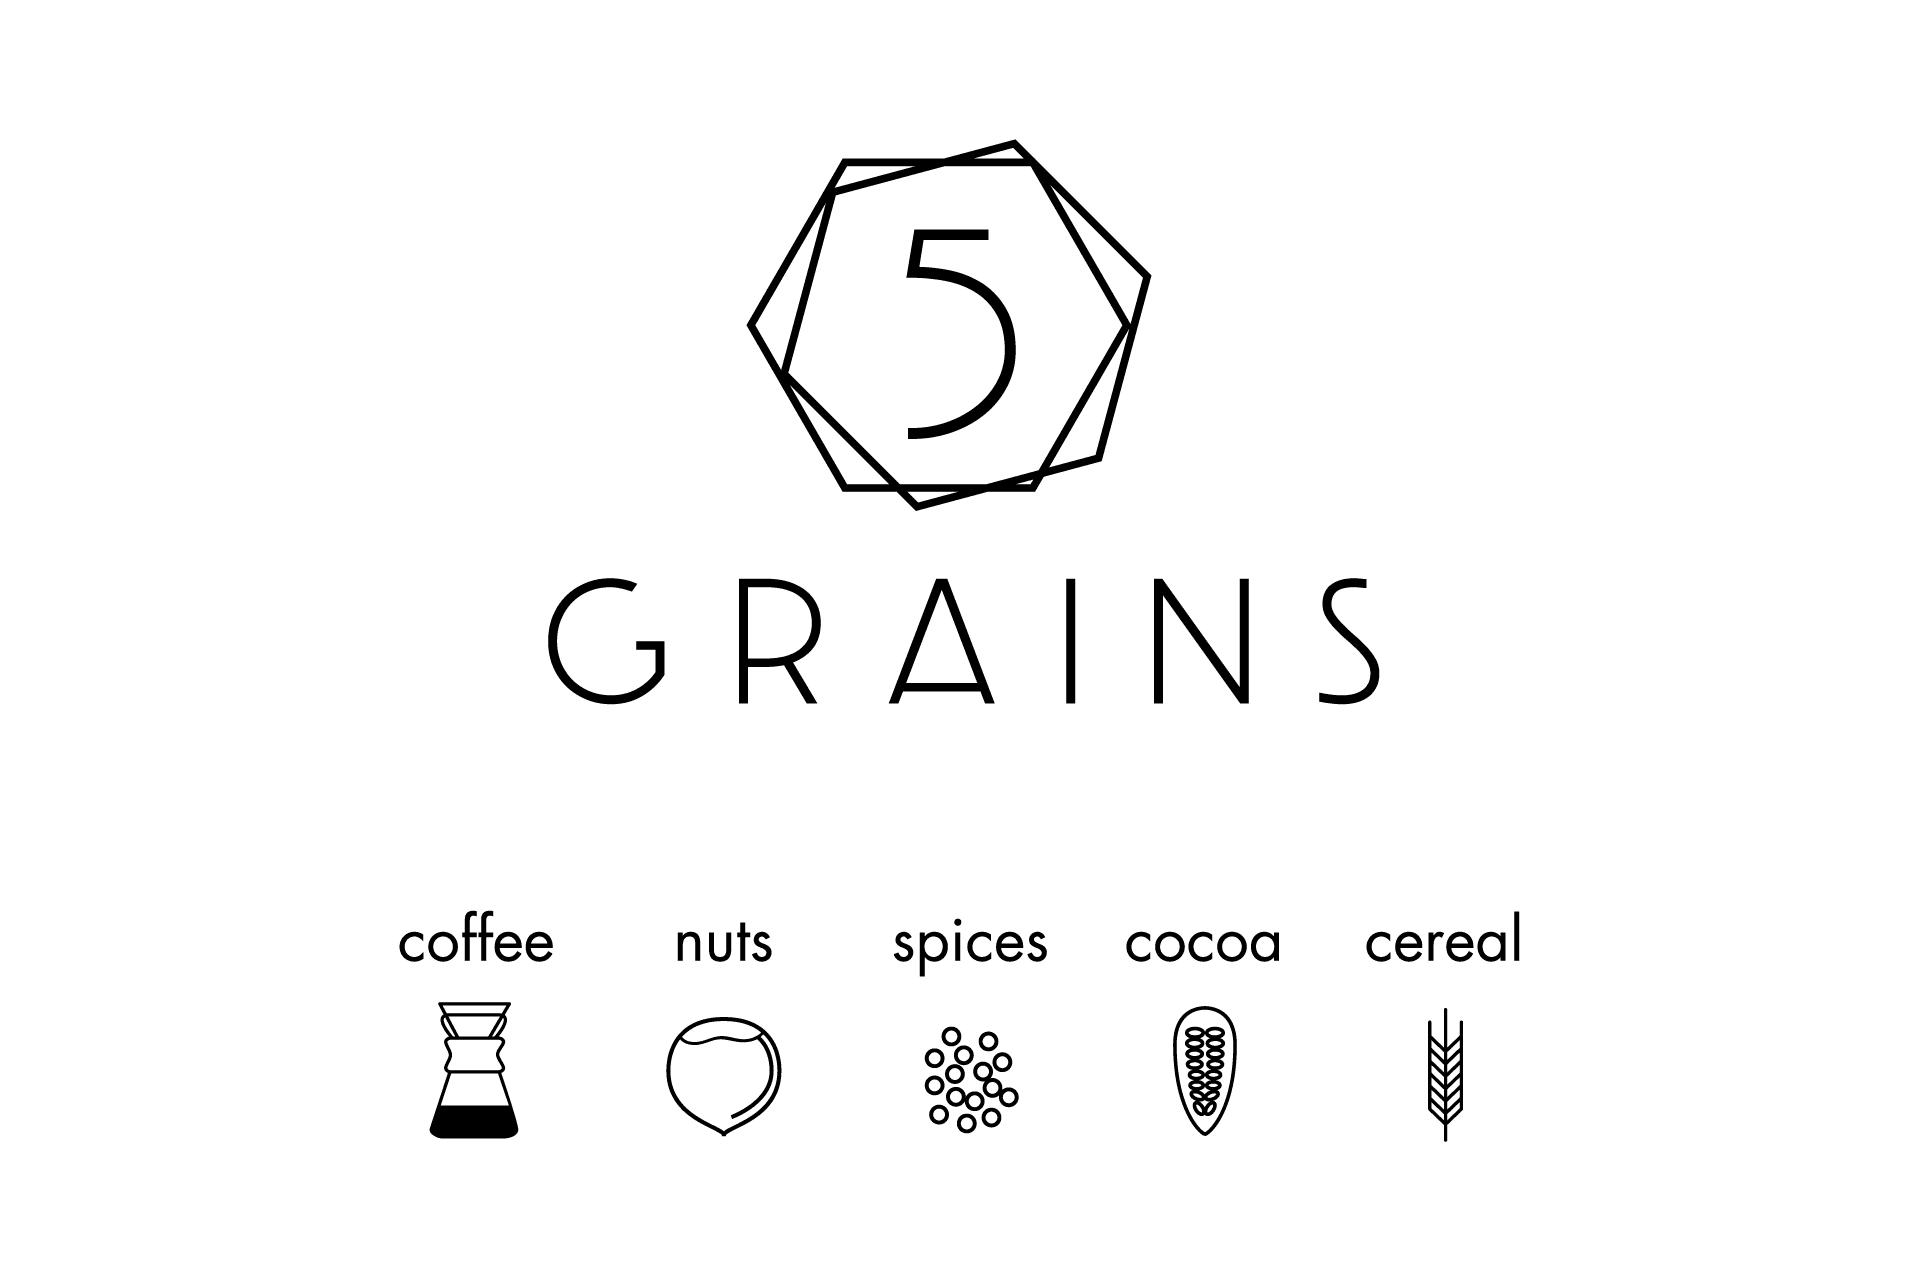 5grains-logo theads.gr